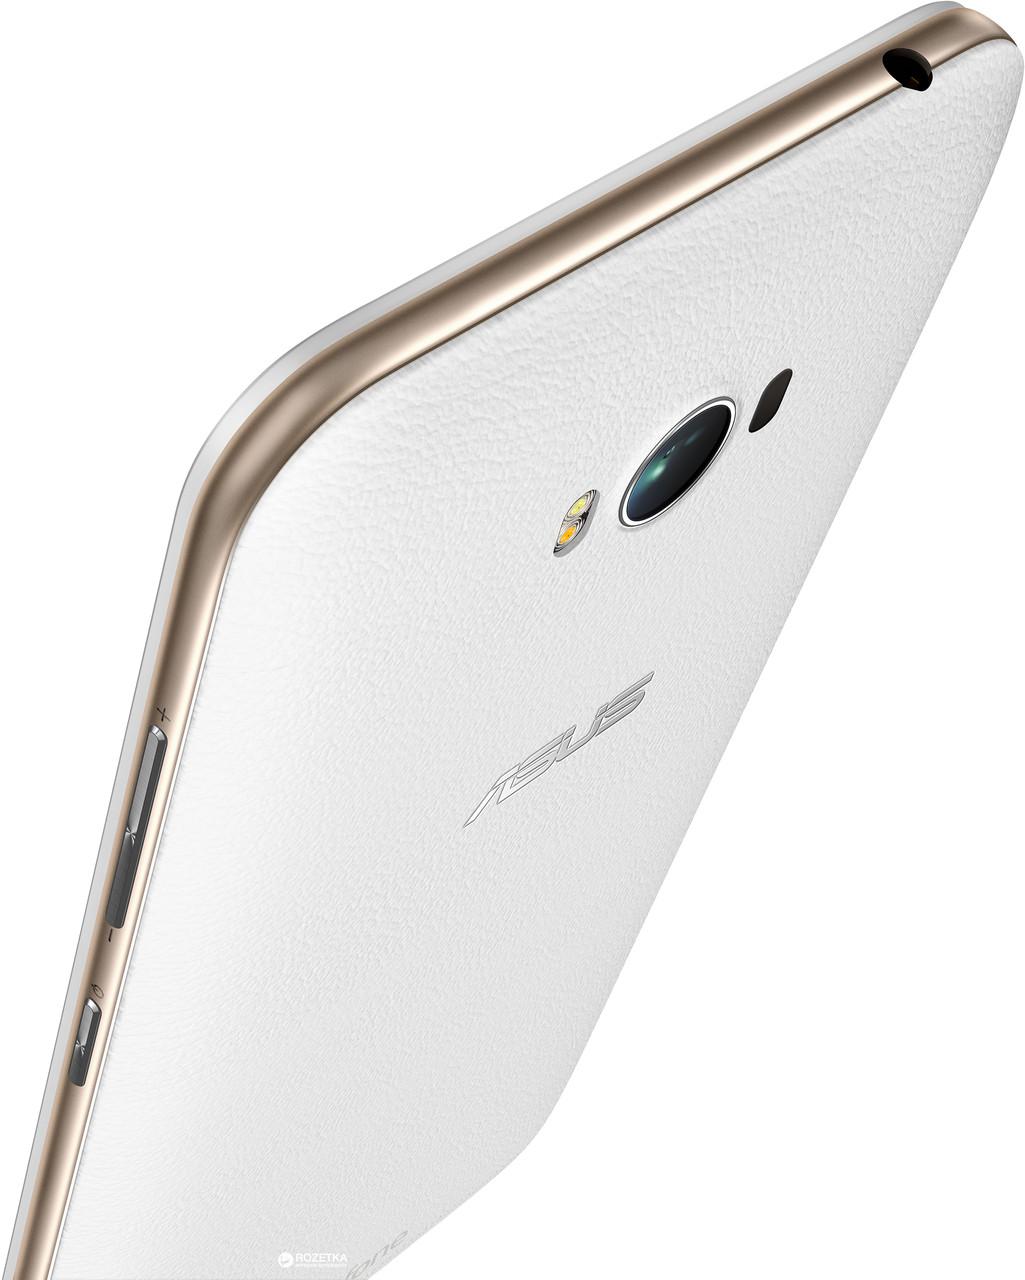 Asus Zenfone Max Pro Zc550kl 2 32gb 2sim 5000mah Black White